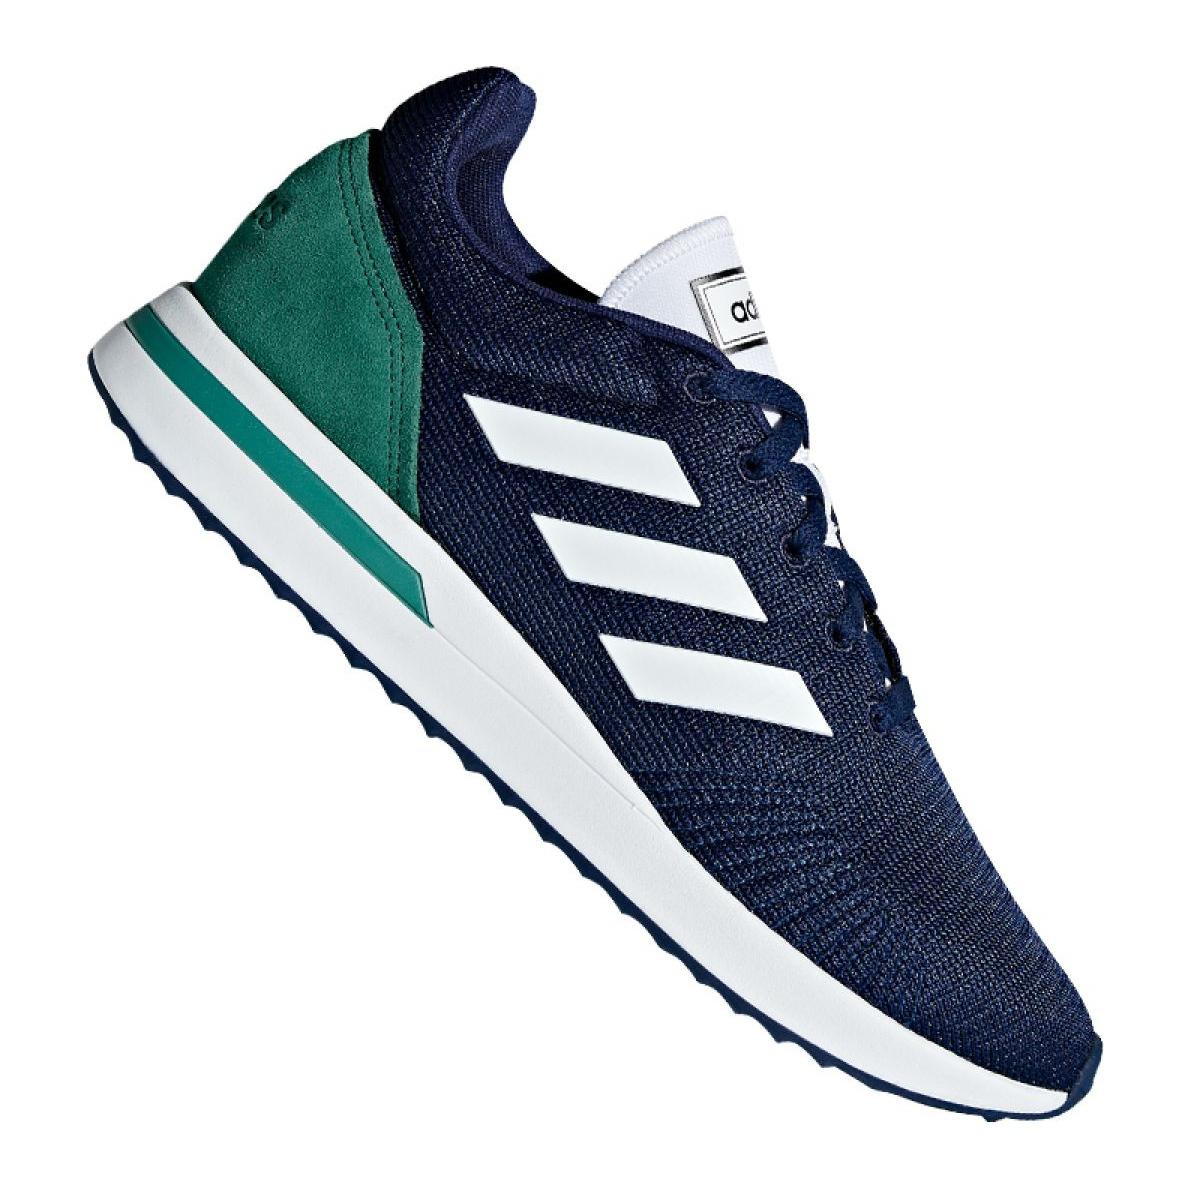 Adidas Run 70S M CG6140 shoes navy